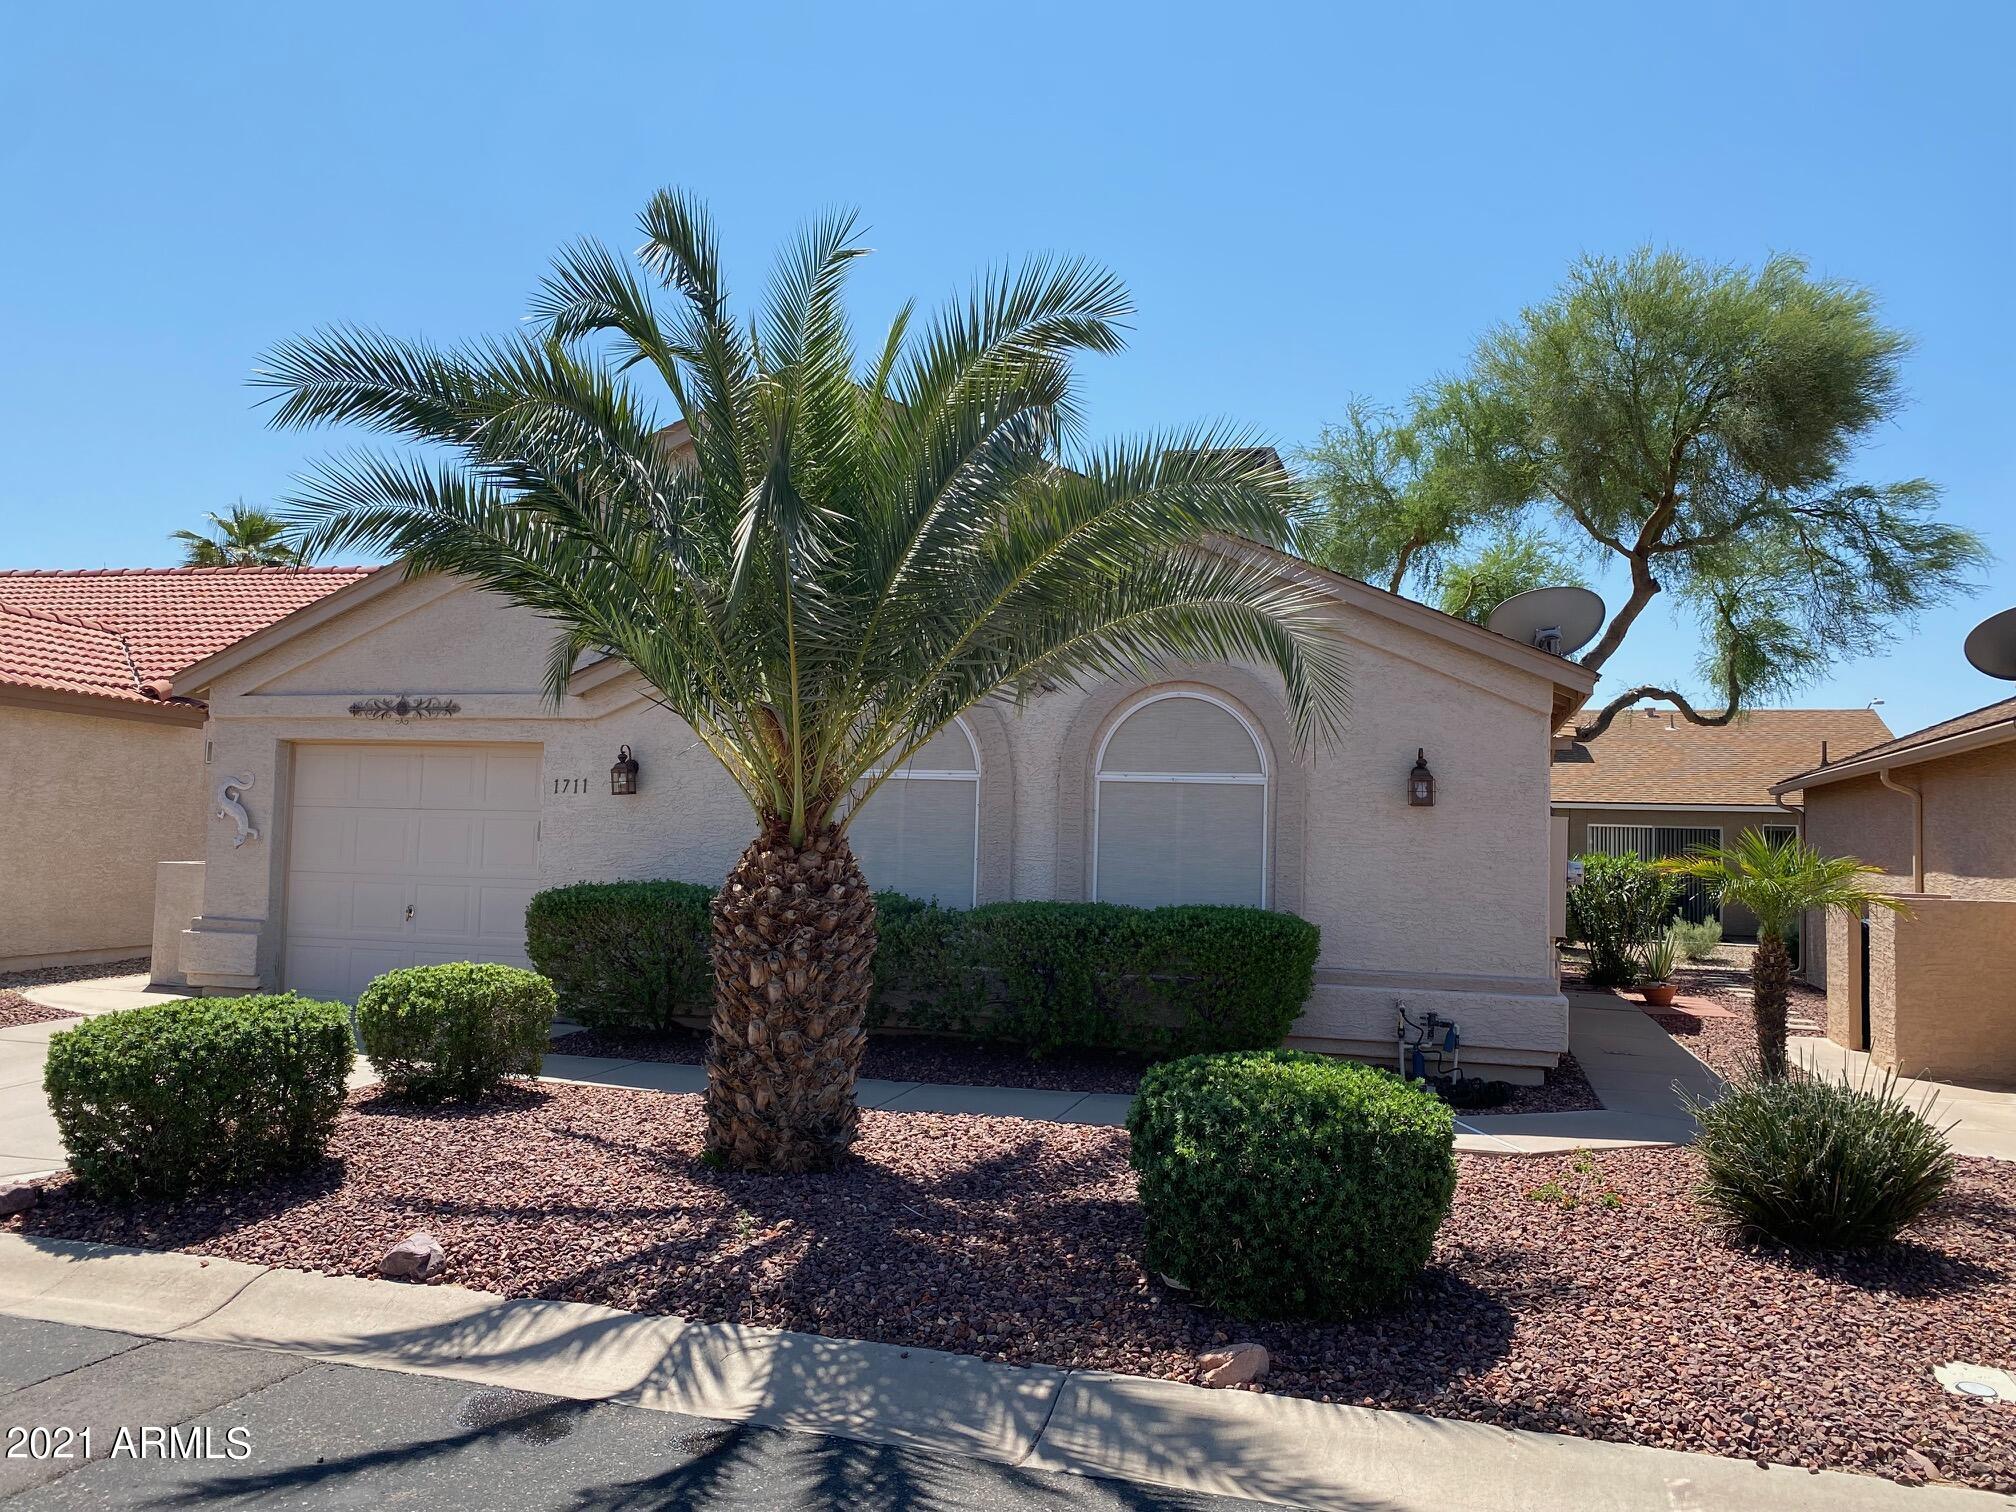 MLS 6293366 1711 E KERBY FARMS Road, Chandler, AZ 85249 Adult Community